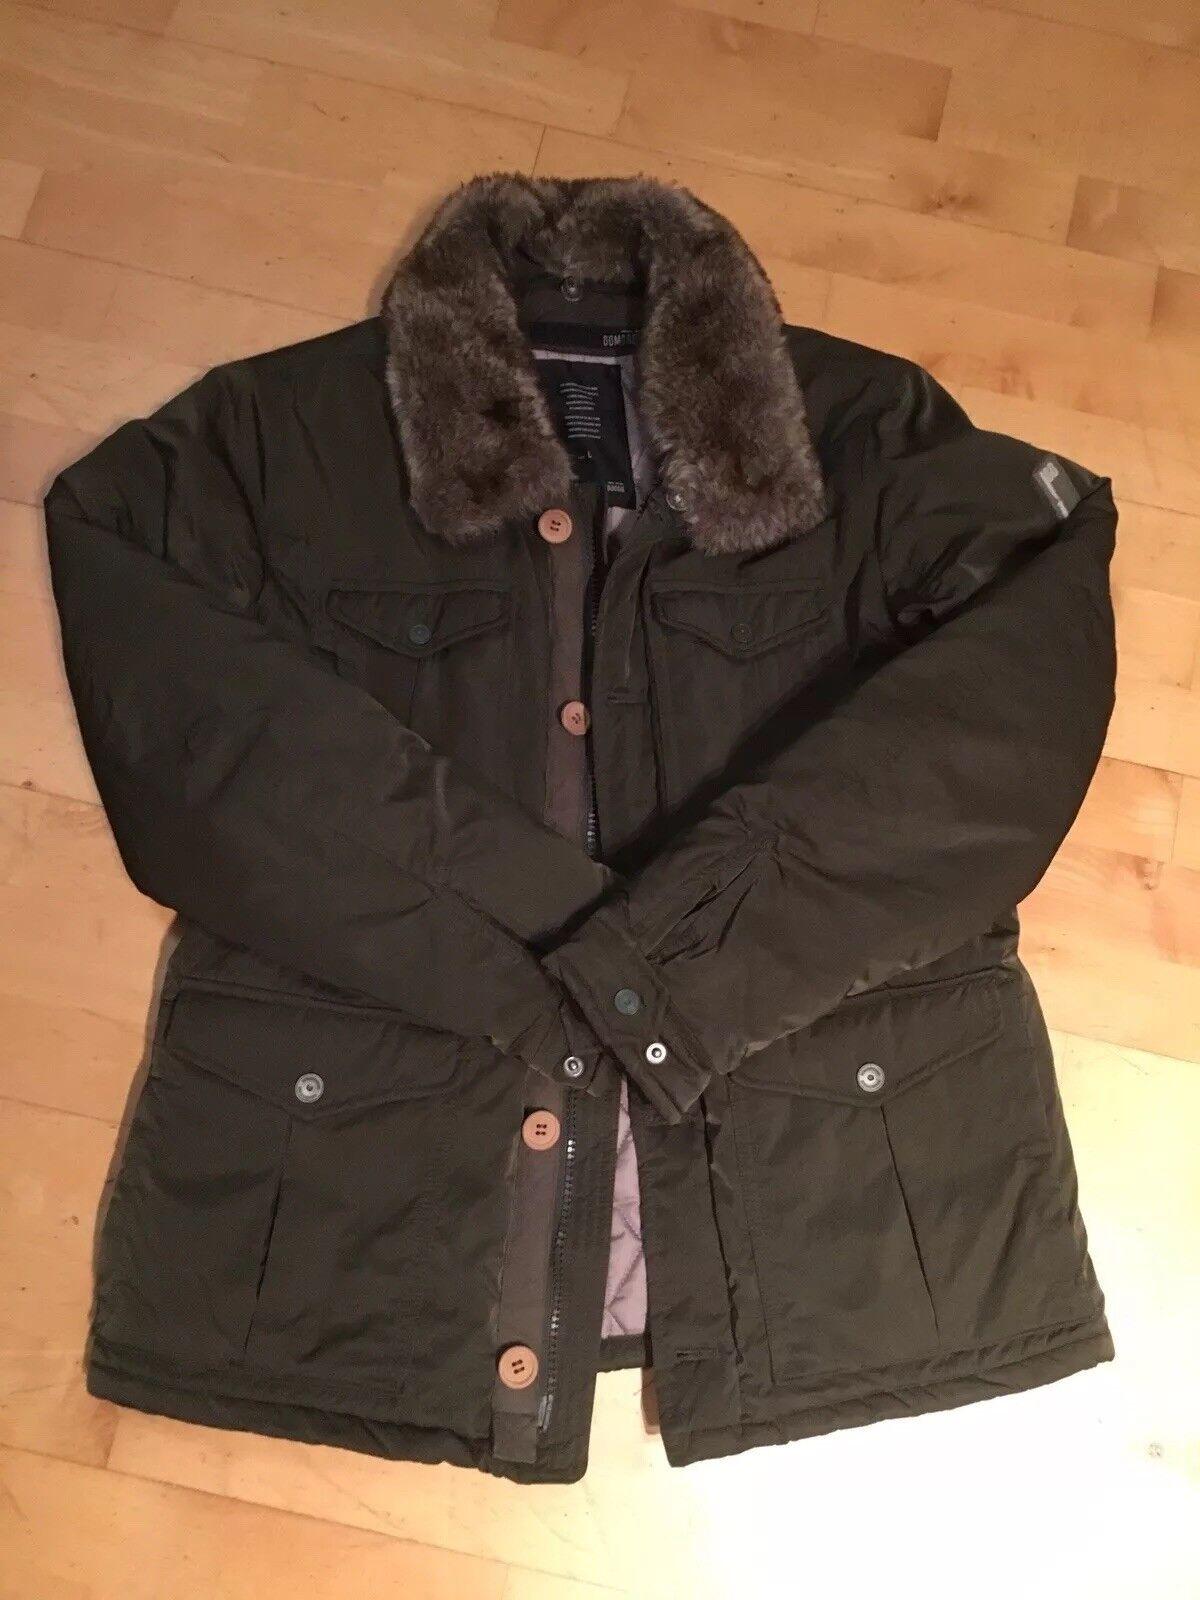 d5b002a4bc6804 Bomboogie Daunenjacke L, Ecodown Größe noibtq2069-neue Kleidung